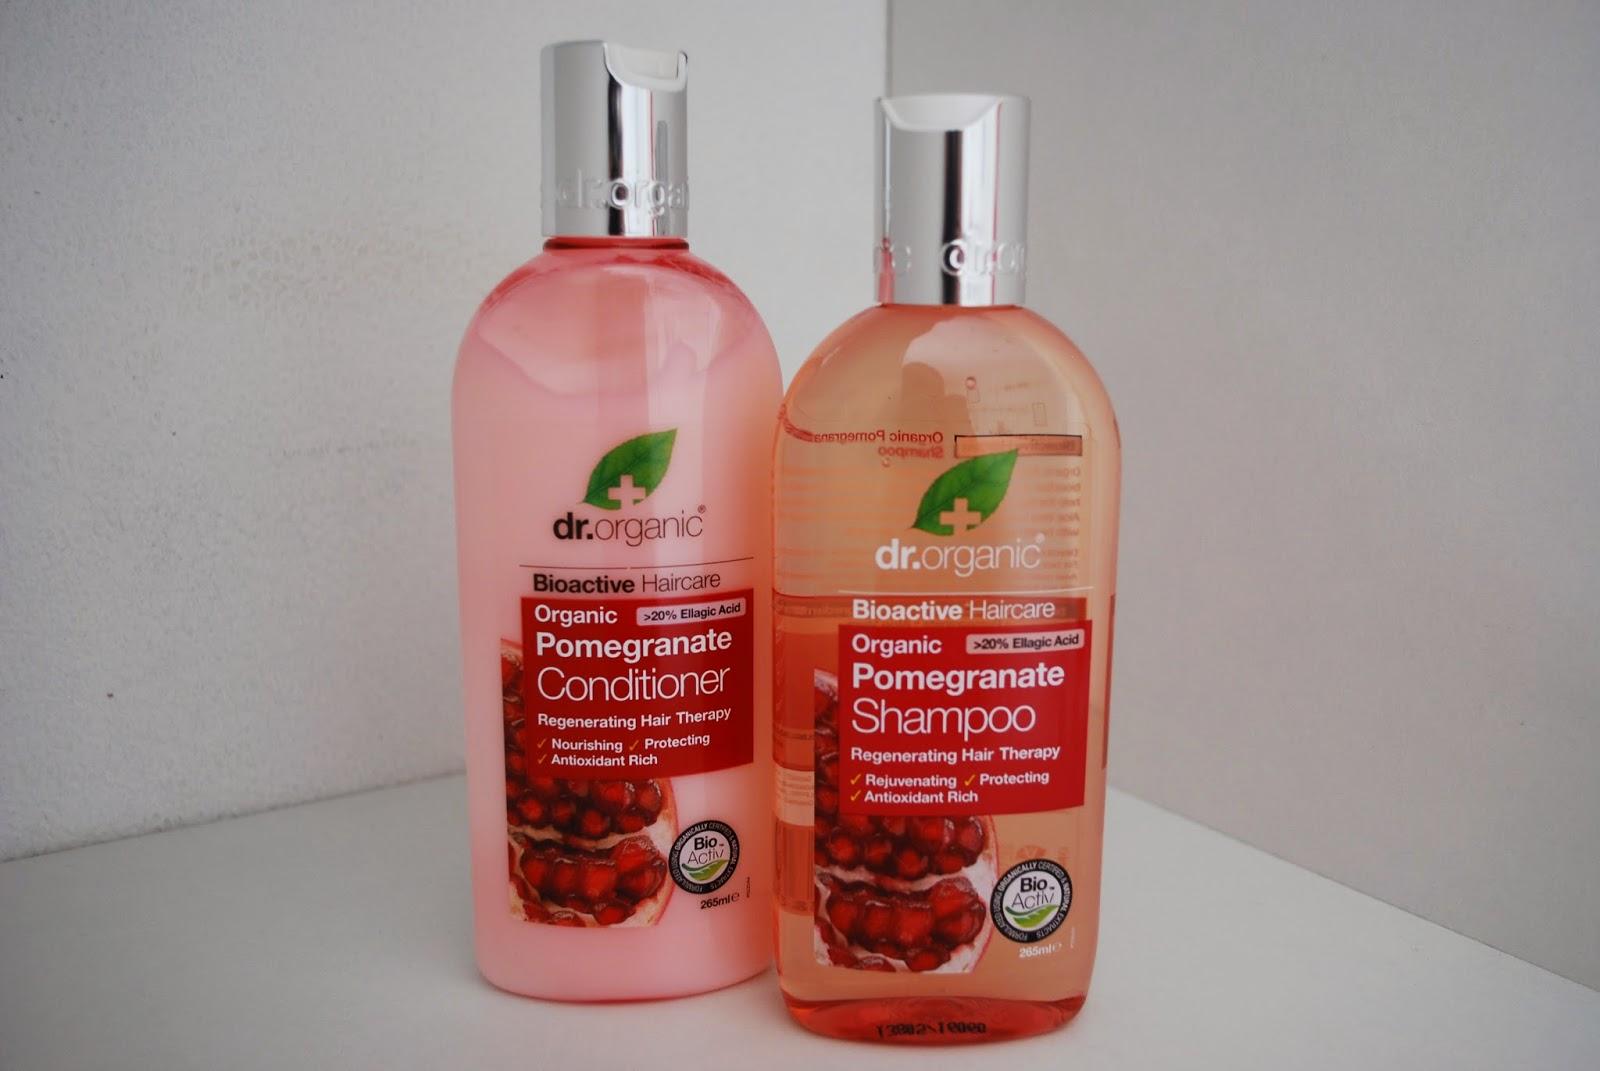 Caring cosmetics Planet Organic: reviews 59